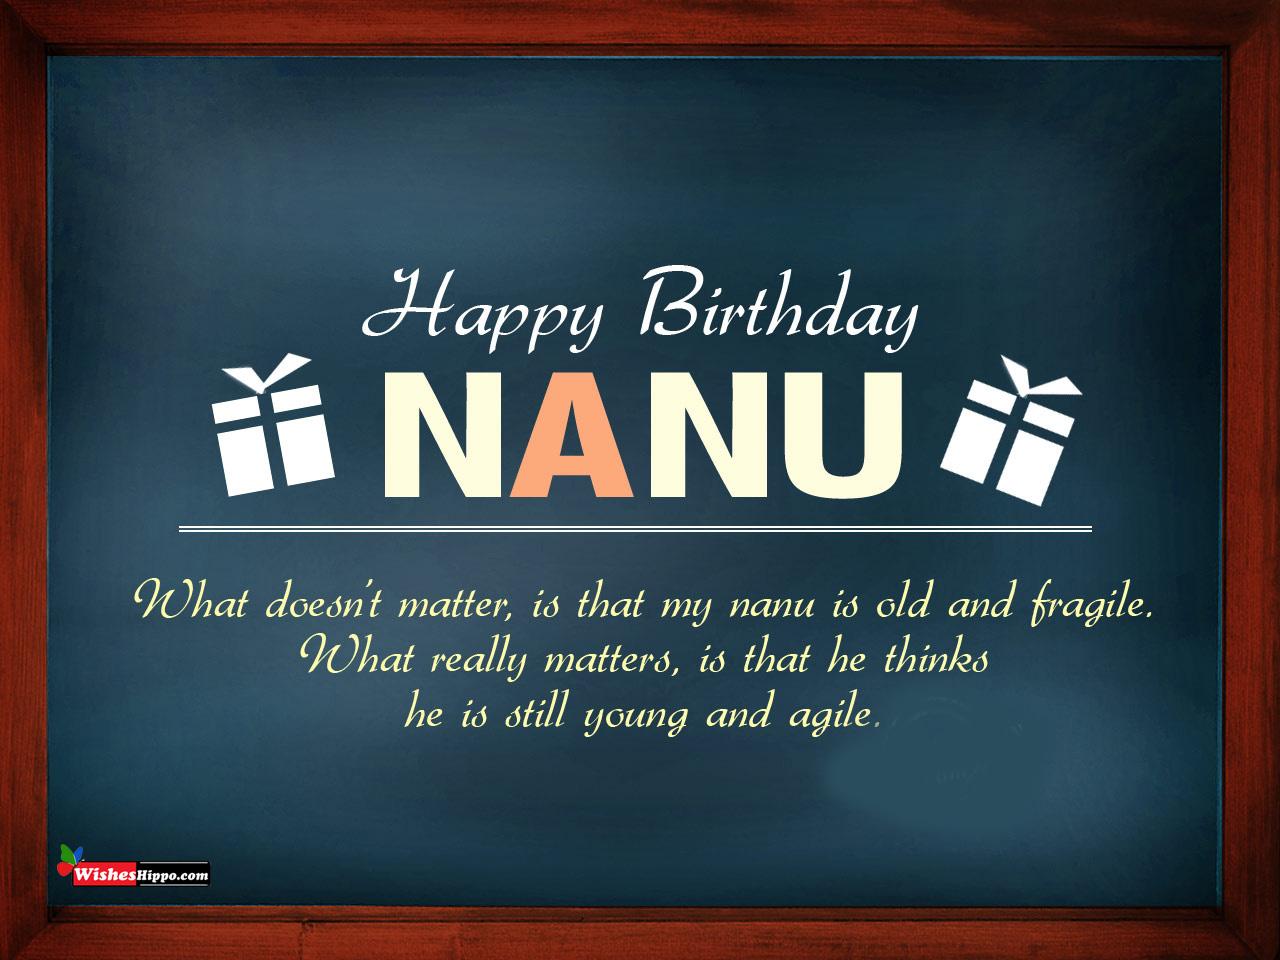 99 Birthday Wishes For Nana Ji In Hindi And English Birthday Image Picture 2021 Wisheshippo